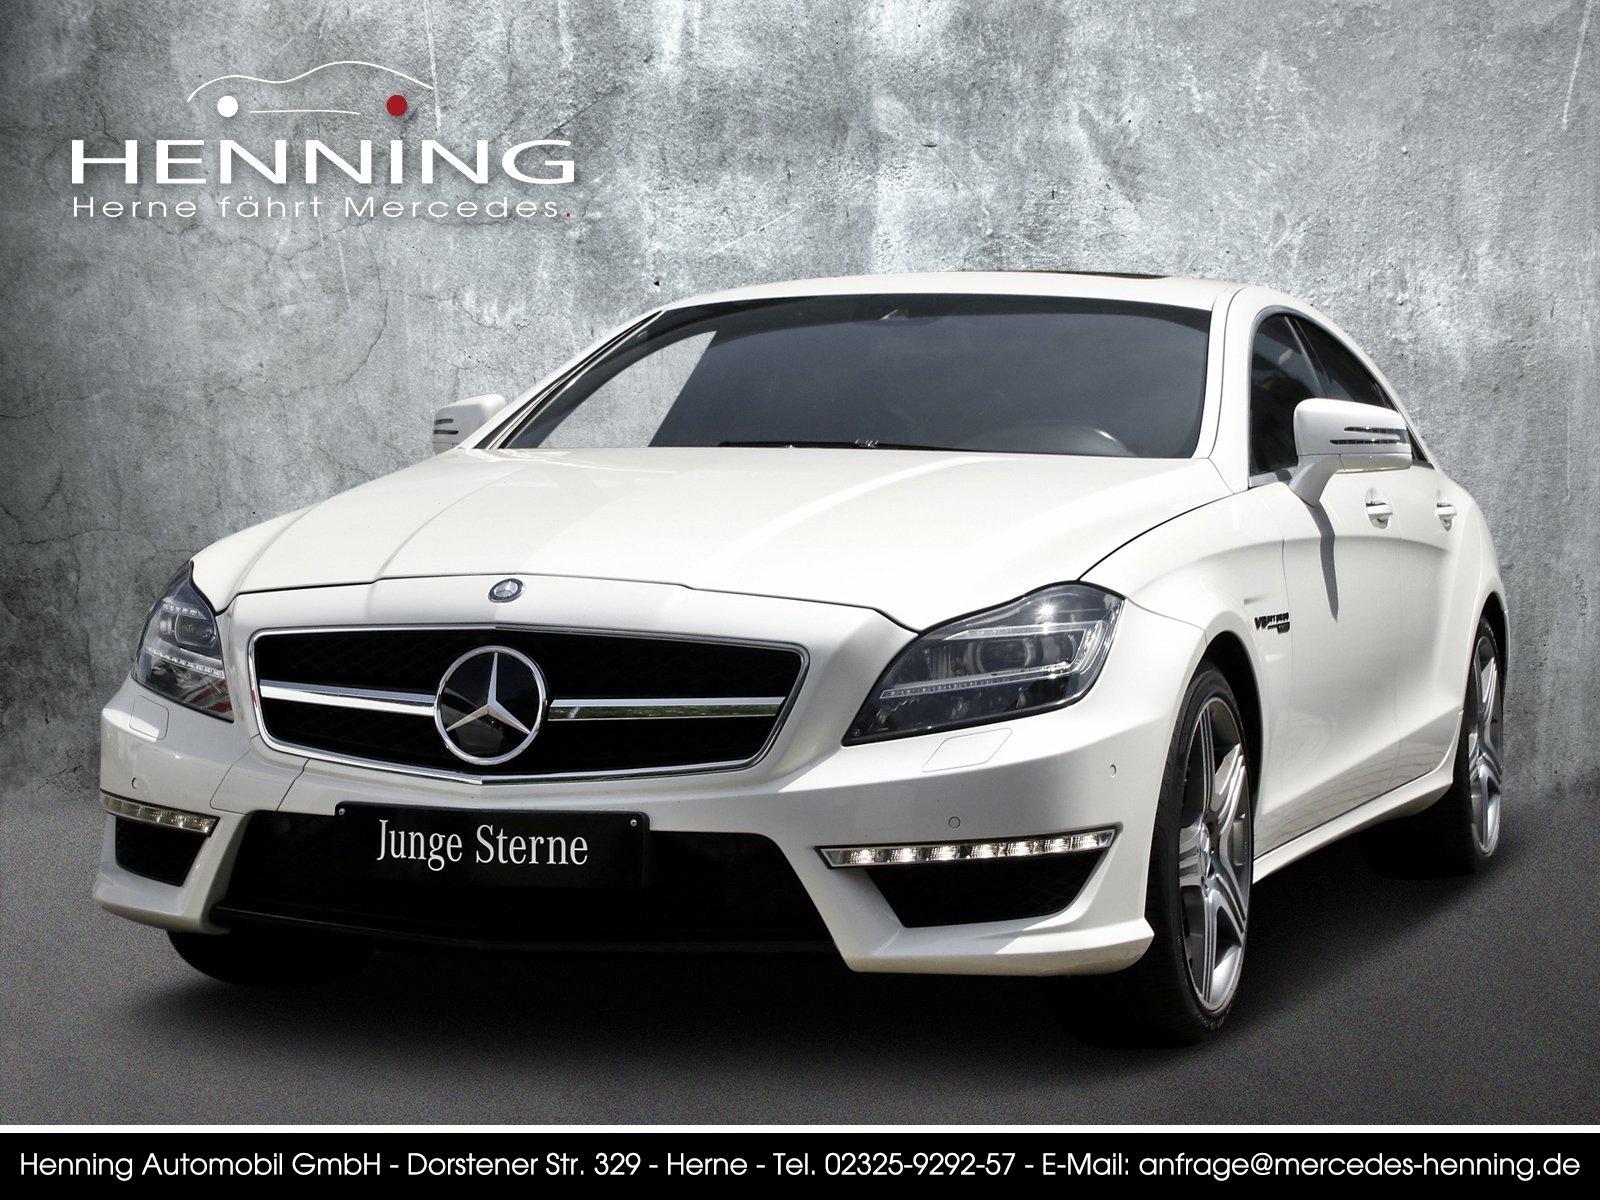 Mercedes-Benz CLS 63 AMG COMAND Memory Abgasanl. Distronic+, Jahr 2013, petrol